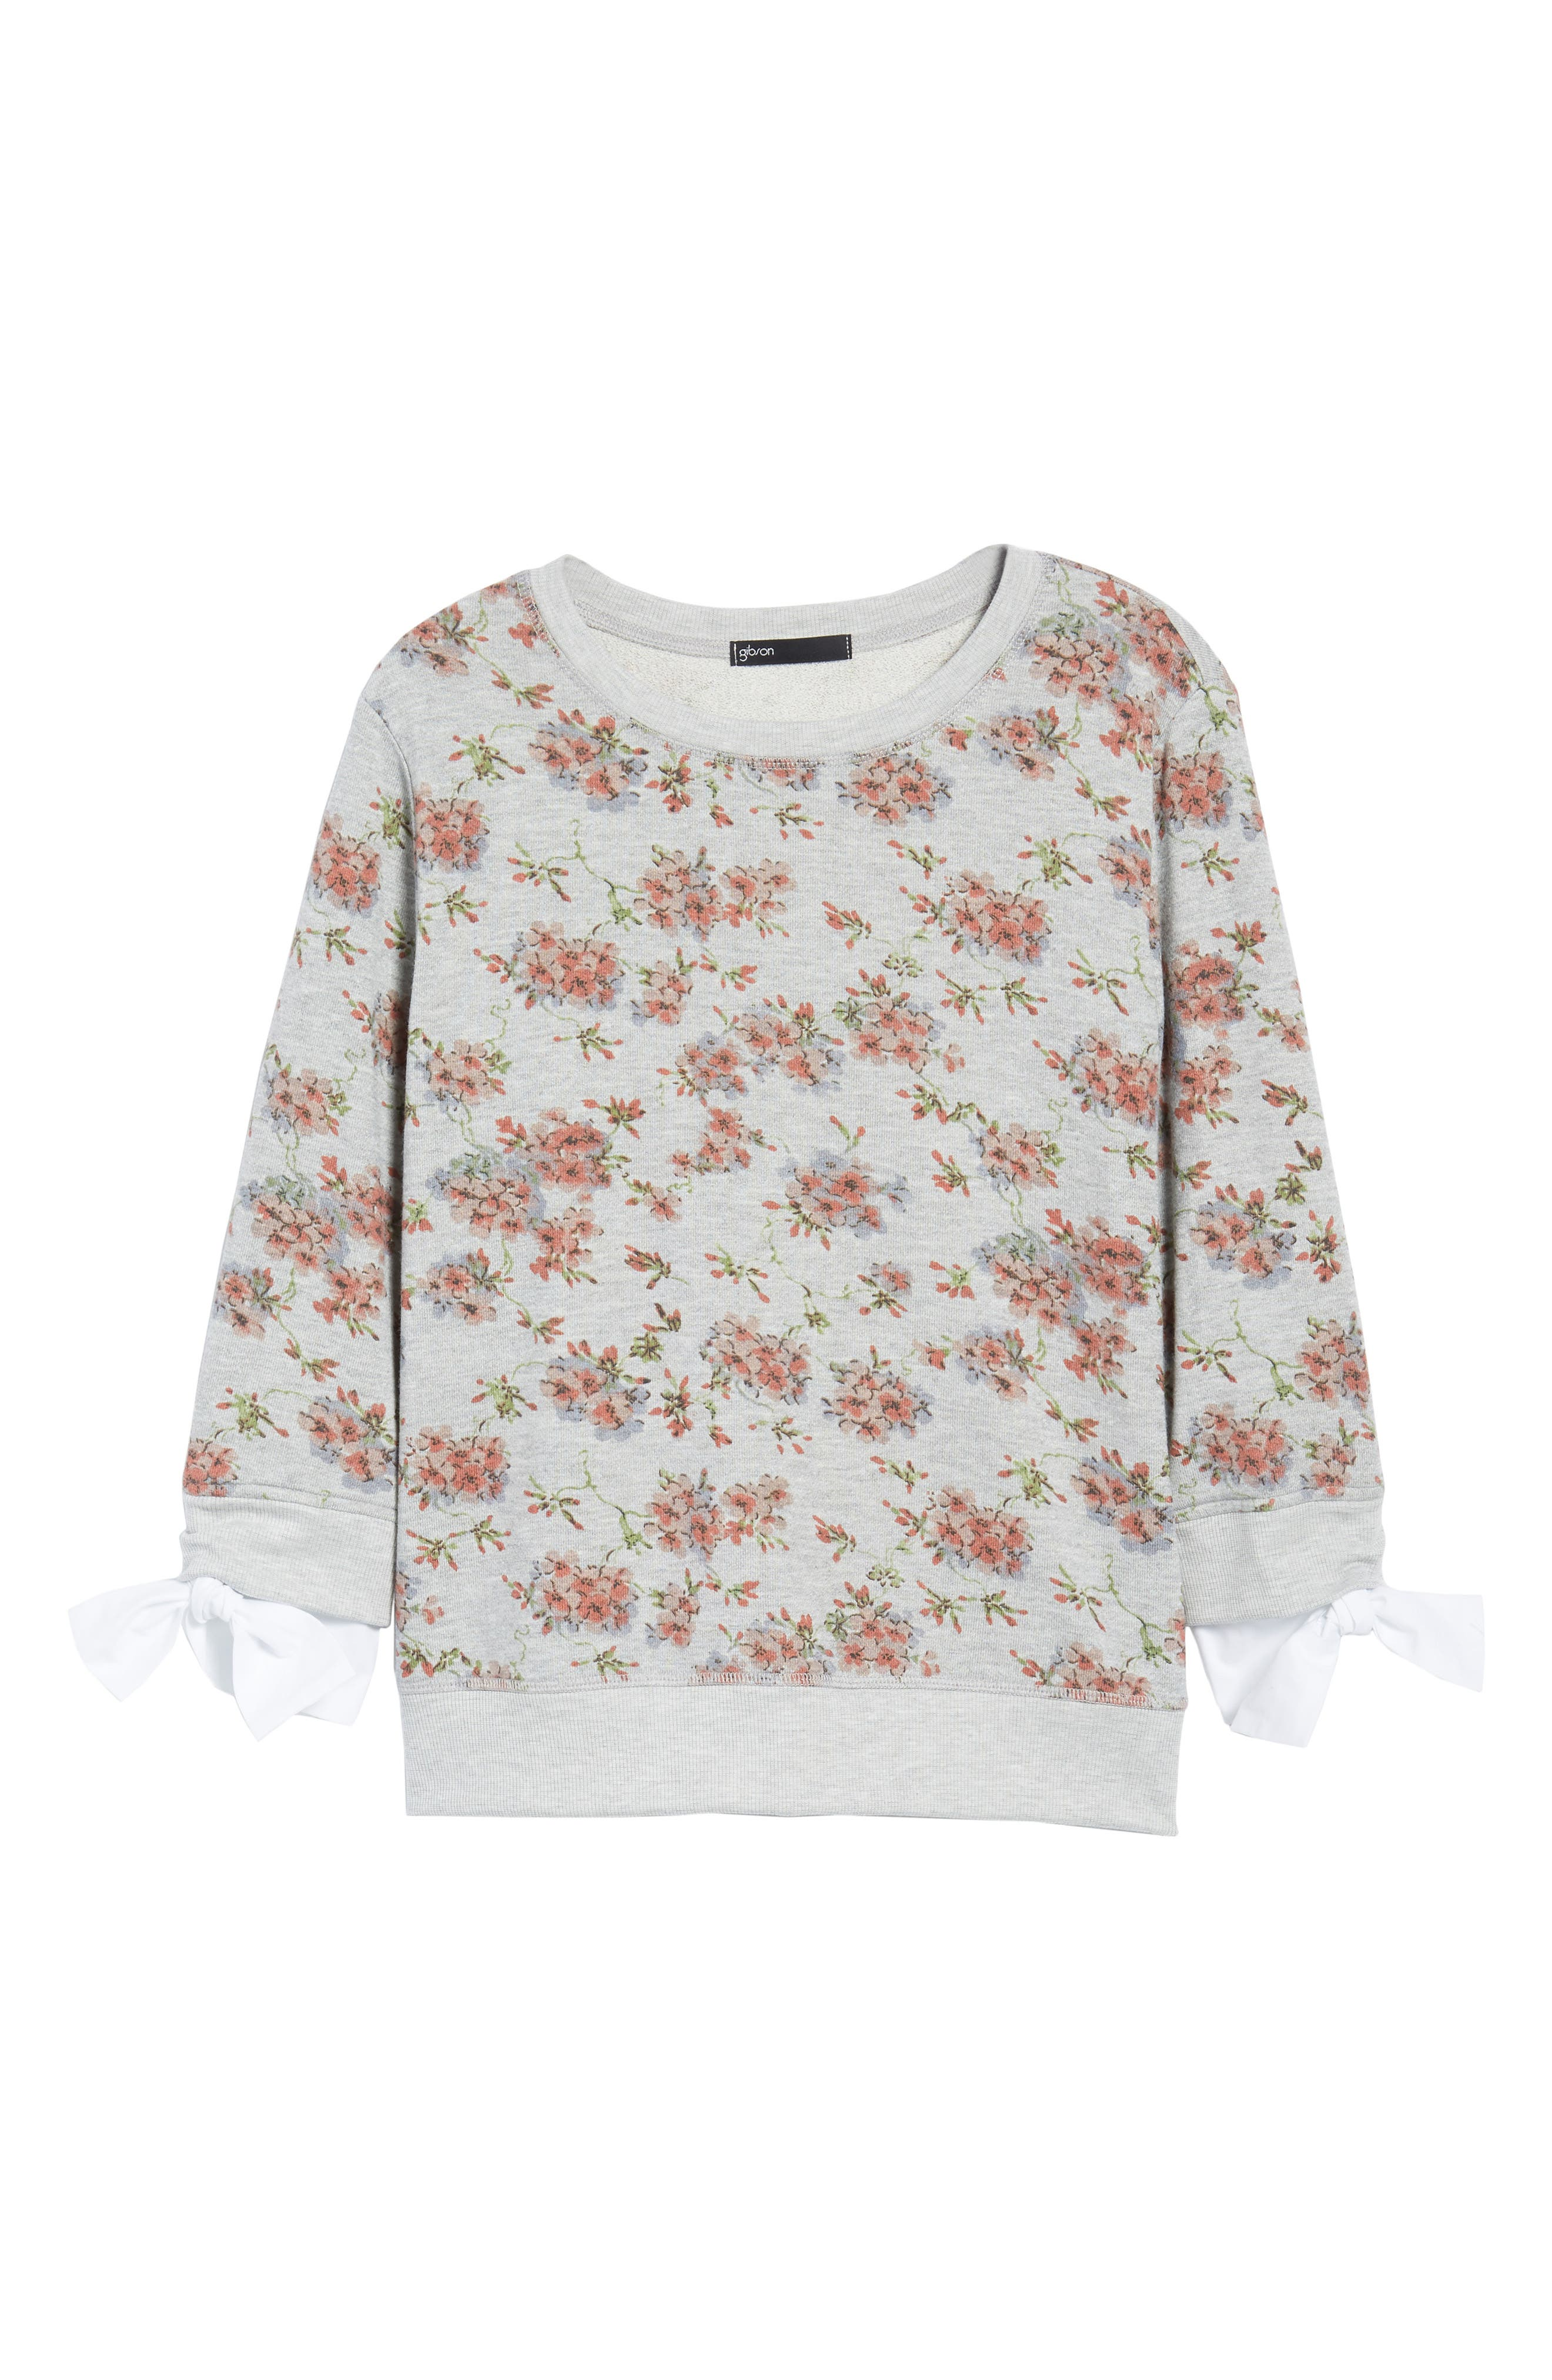 Poplin Cuff Sweatshirt,                             Alternate thumbnail 7, color,                             Grey Blush Floral W/ White